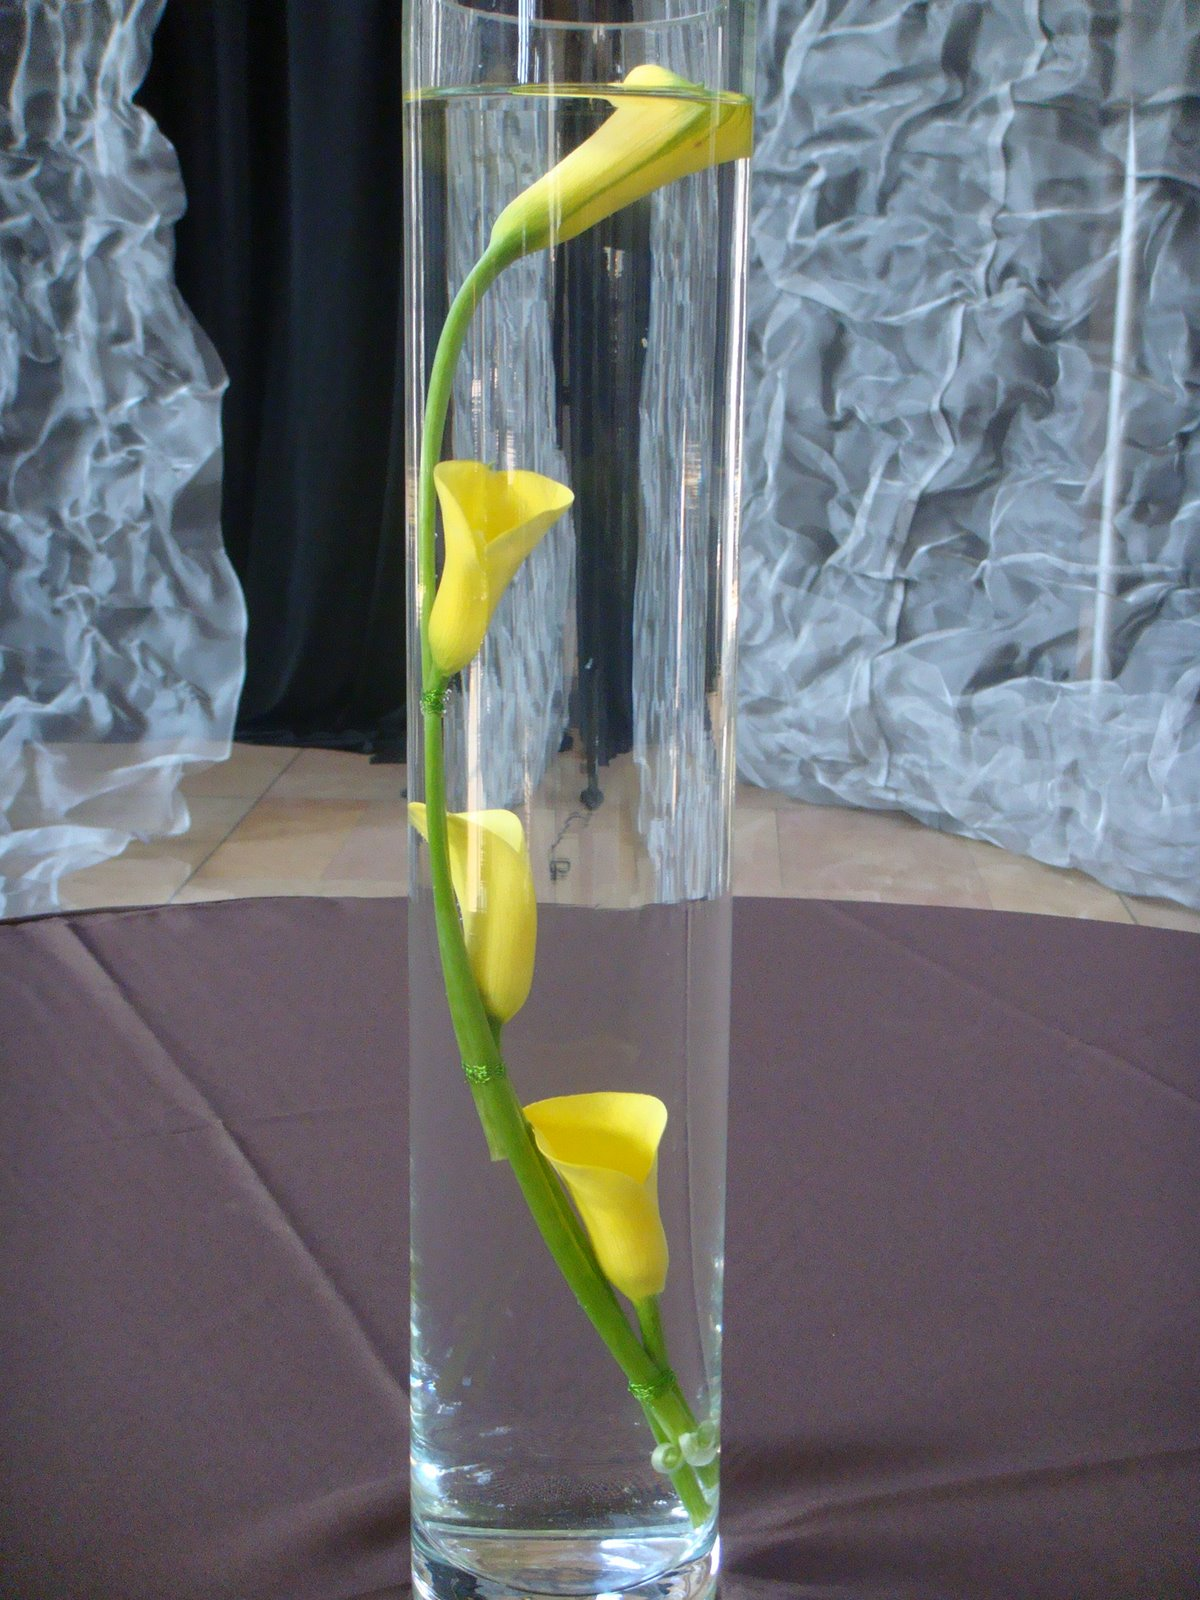 http://2.bp.blogspot.com/_JNOXKSOMWCw/TJ4Yzr_rj8I/AAAAAAAAAE4/_oO5VlWpuss/s1600/calla-lily-submerged-yellow-cylinder.jpg